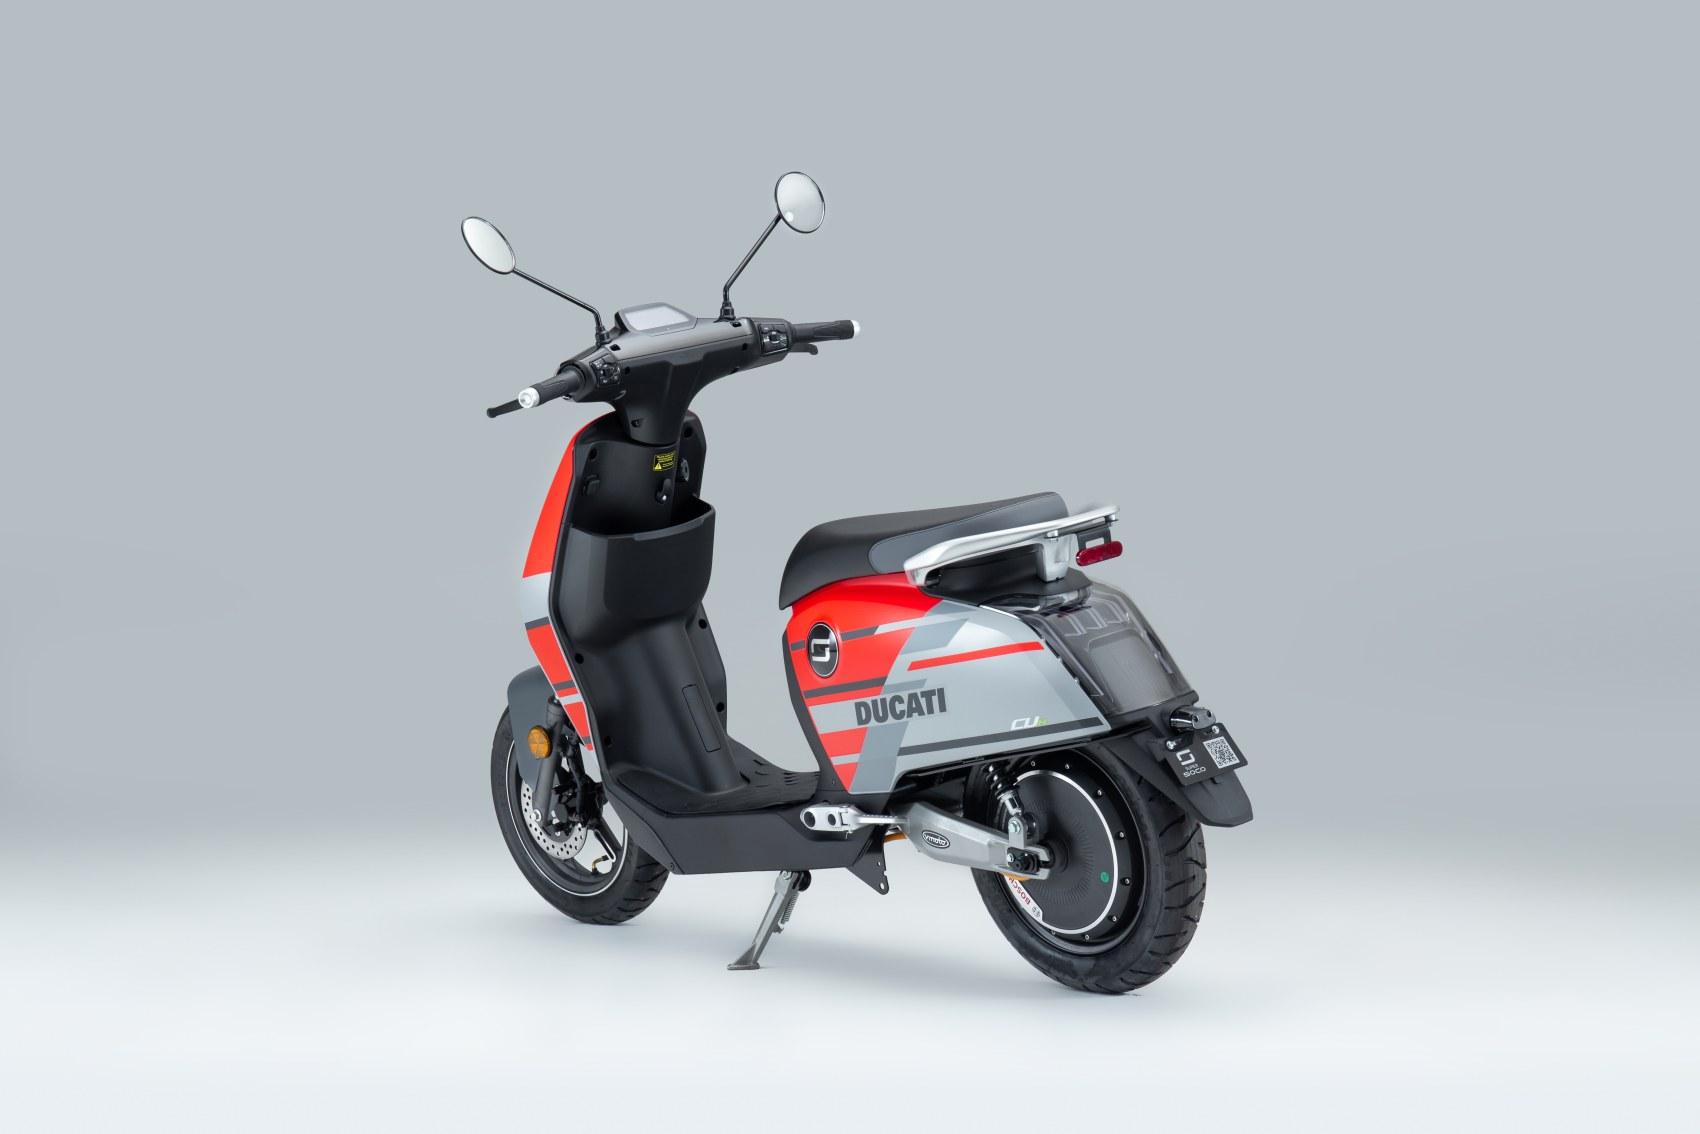 Super Soco CUx electric scooter Ducati Edition rear three quarter image